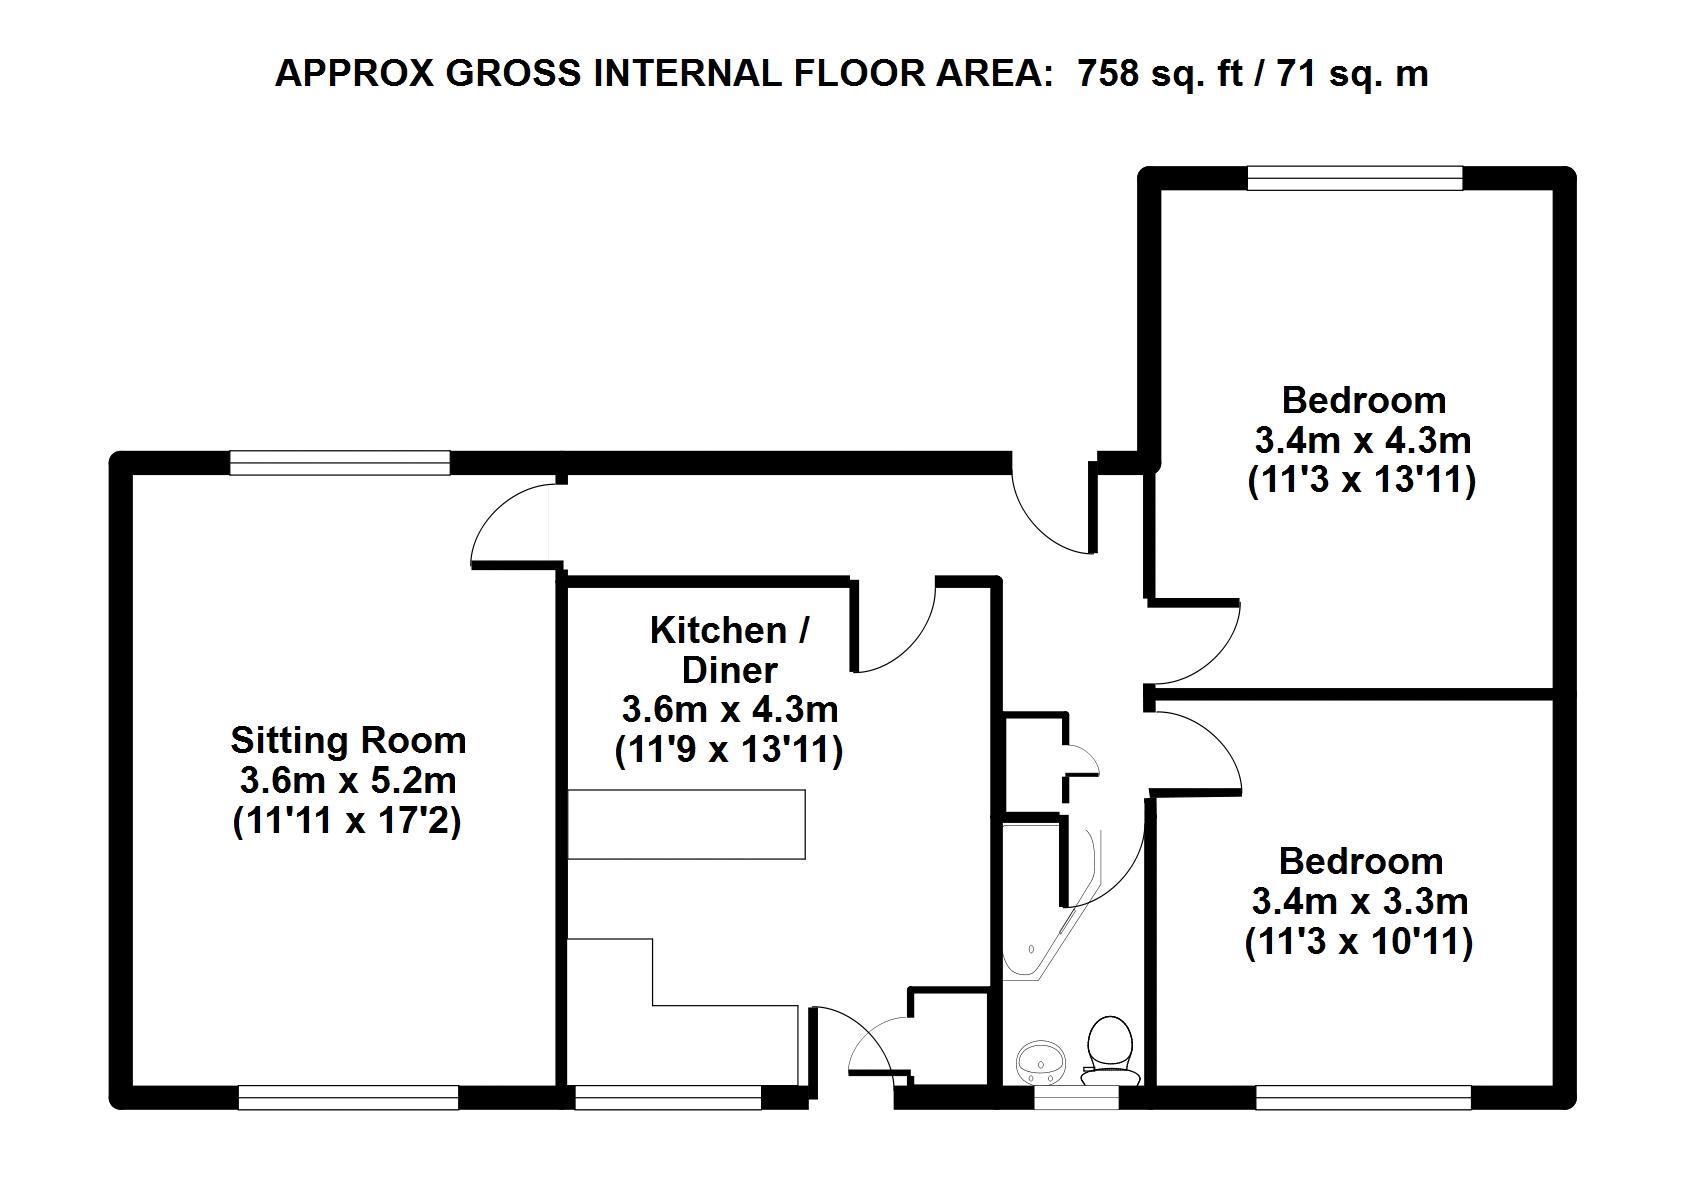 Current Floorplan